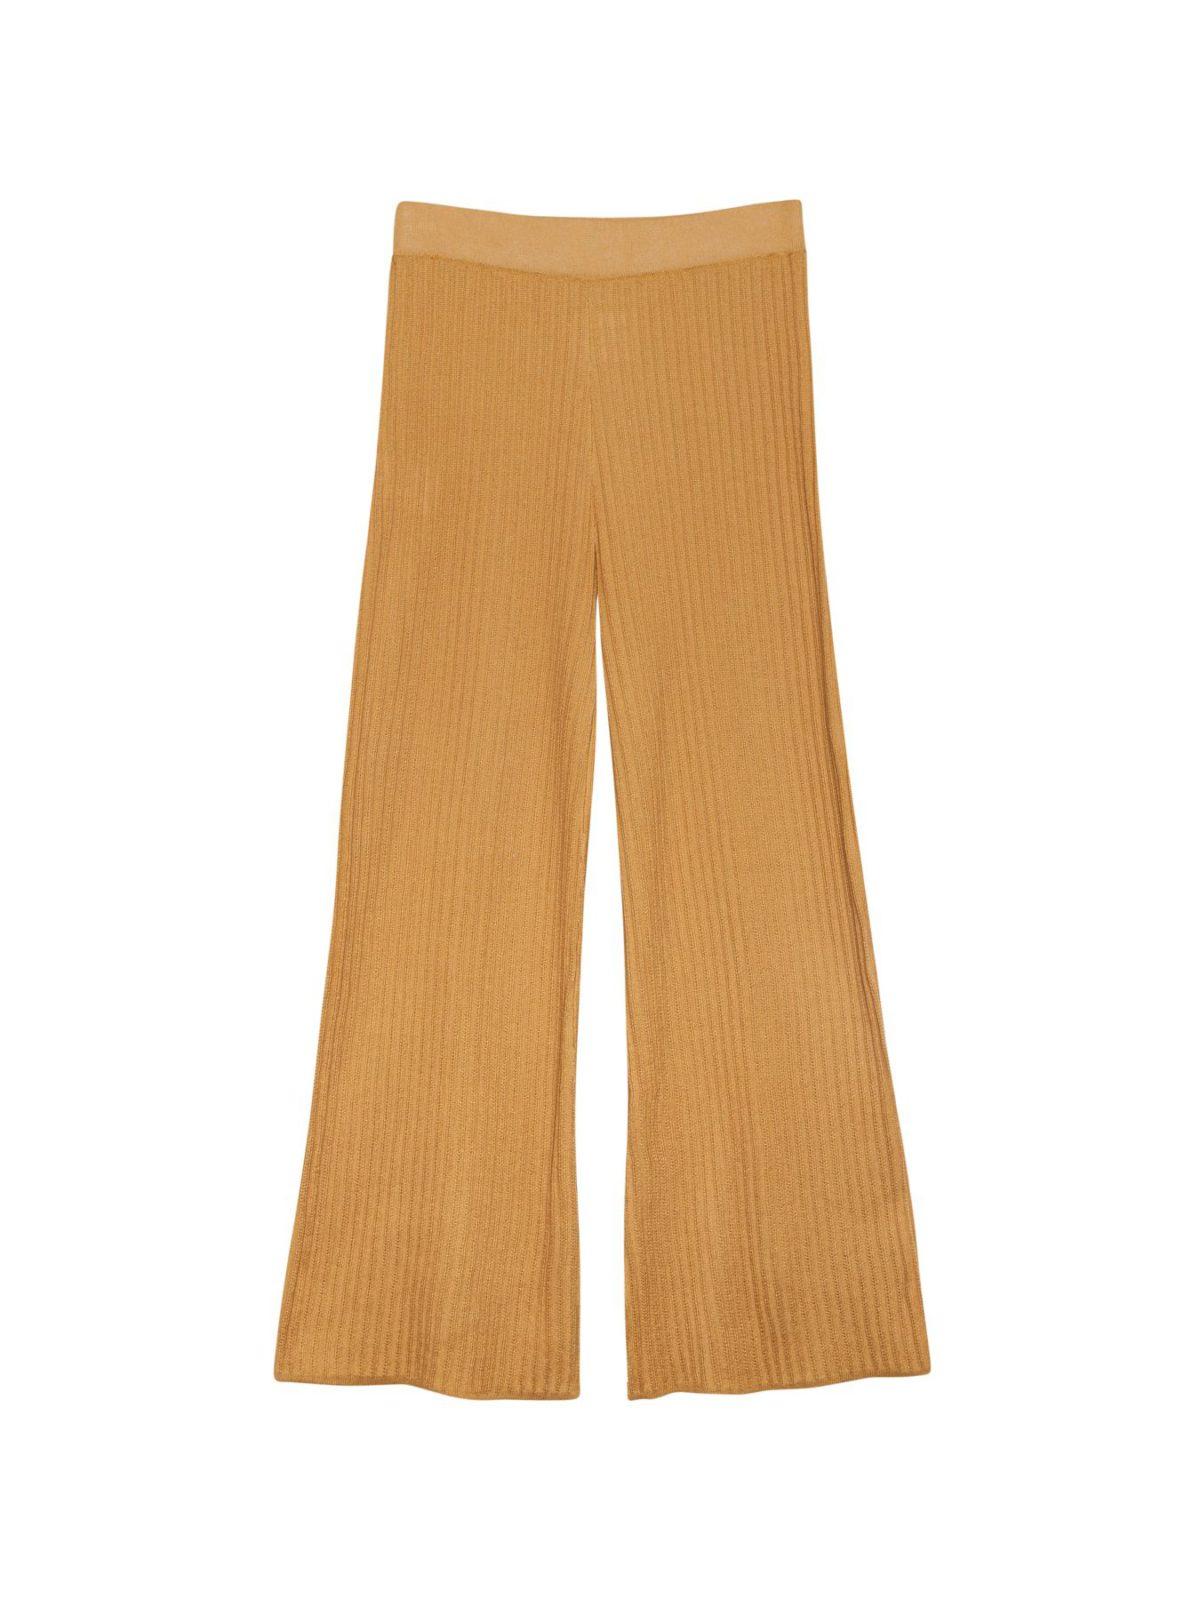 comfy-caroline-trousers-gold